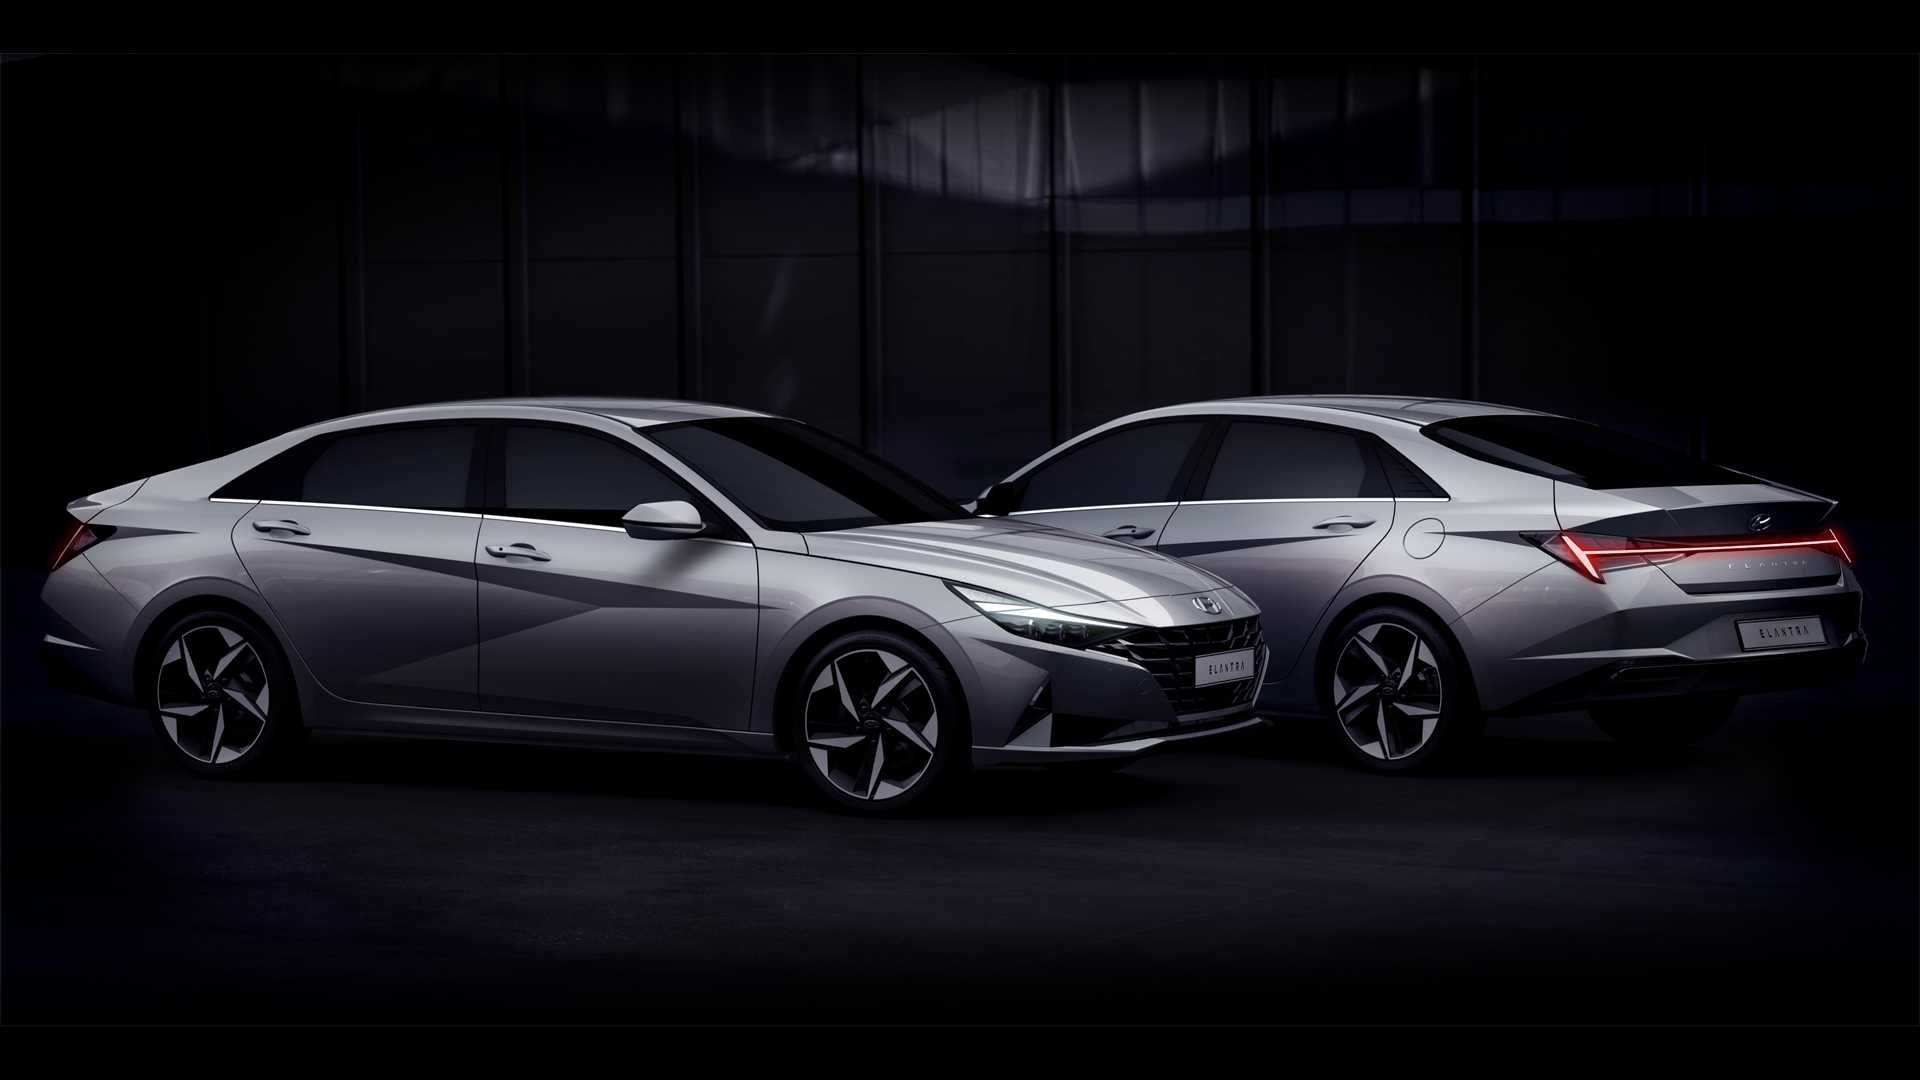 2021 Hyundai Elantra Debuts With Bigger Size Upmarket Tech Hyundai Elantra Elantra Hyundai